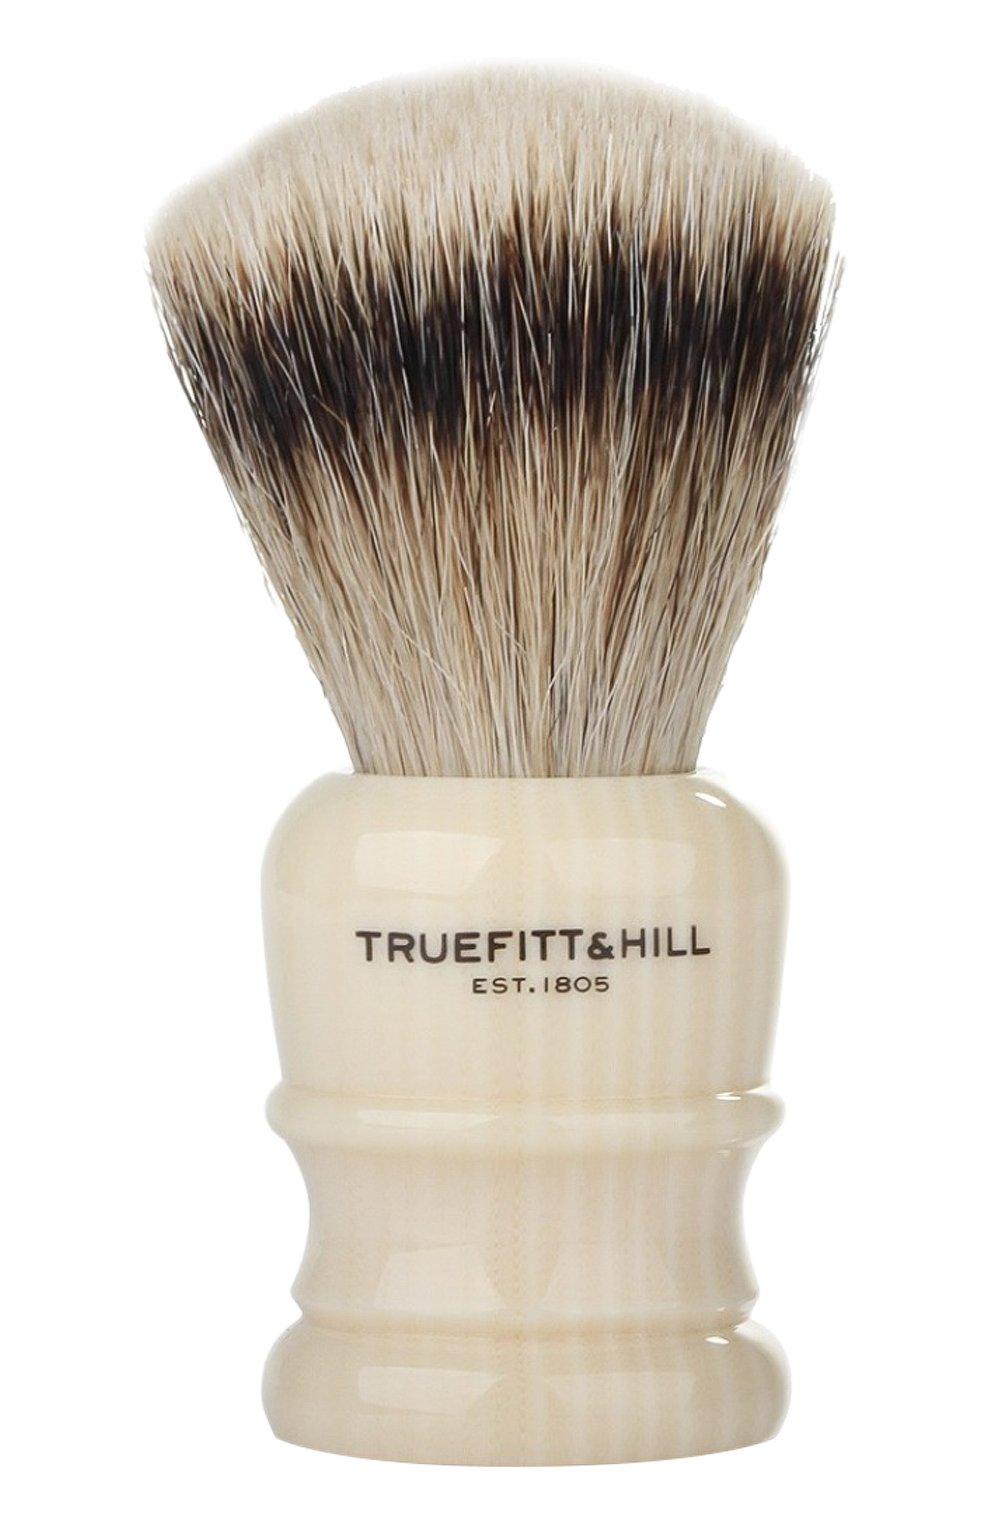 Мужская помазок wellington TRUEFITT&HILL бесцветного цвета, арт. 189 | Фото 1 (Статус проверки: Проверена категория)